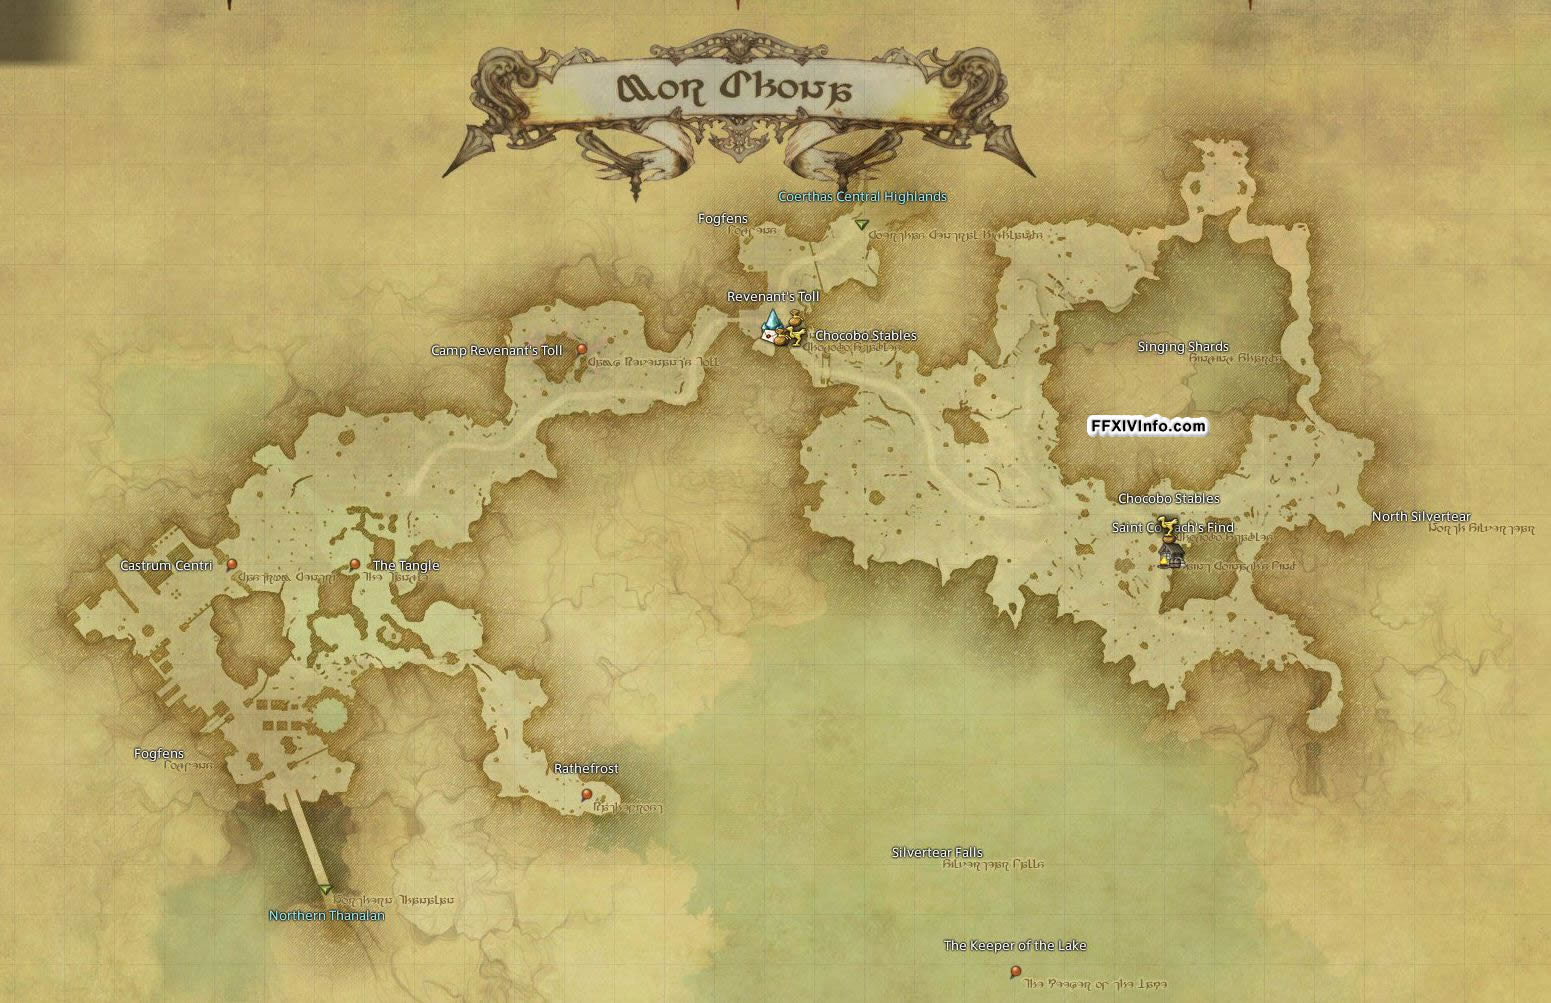 Mor Dhona - Maps | FFXIV: A Realm Reborn Info (FF14)